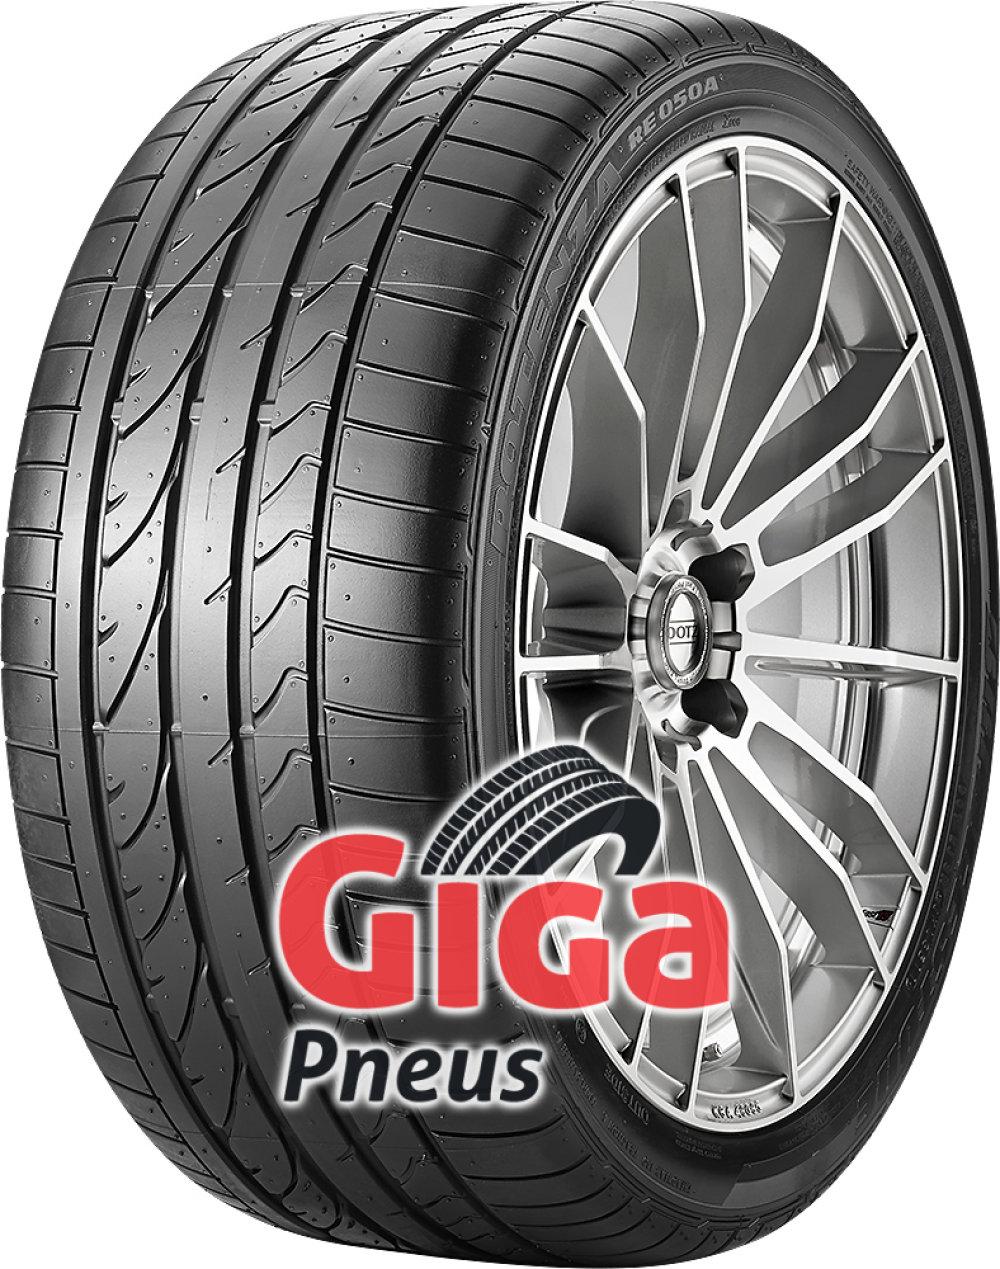 Bridgestone Potenza RE 050 A Pole Position ( 285/35 ZR19 (99Y) Double inscription 99ZR, avec protège-jante (MFS) )